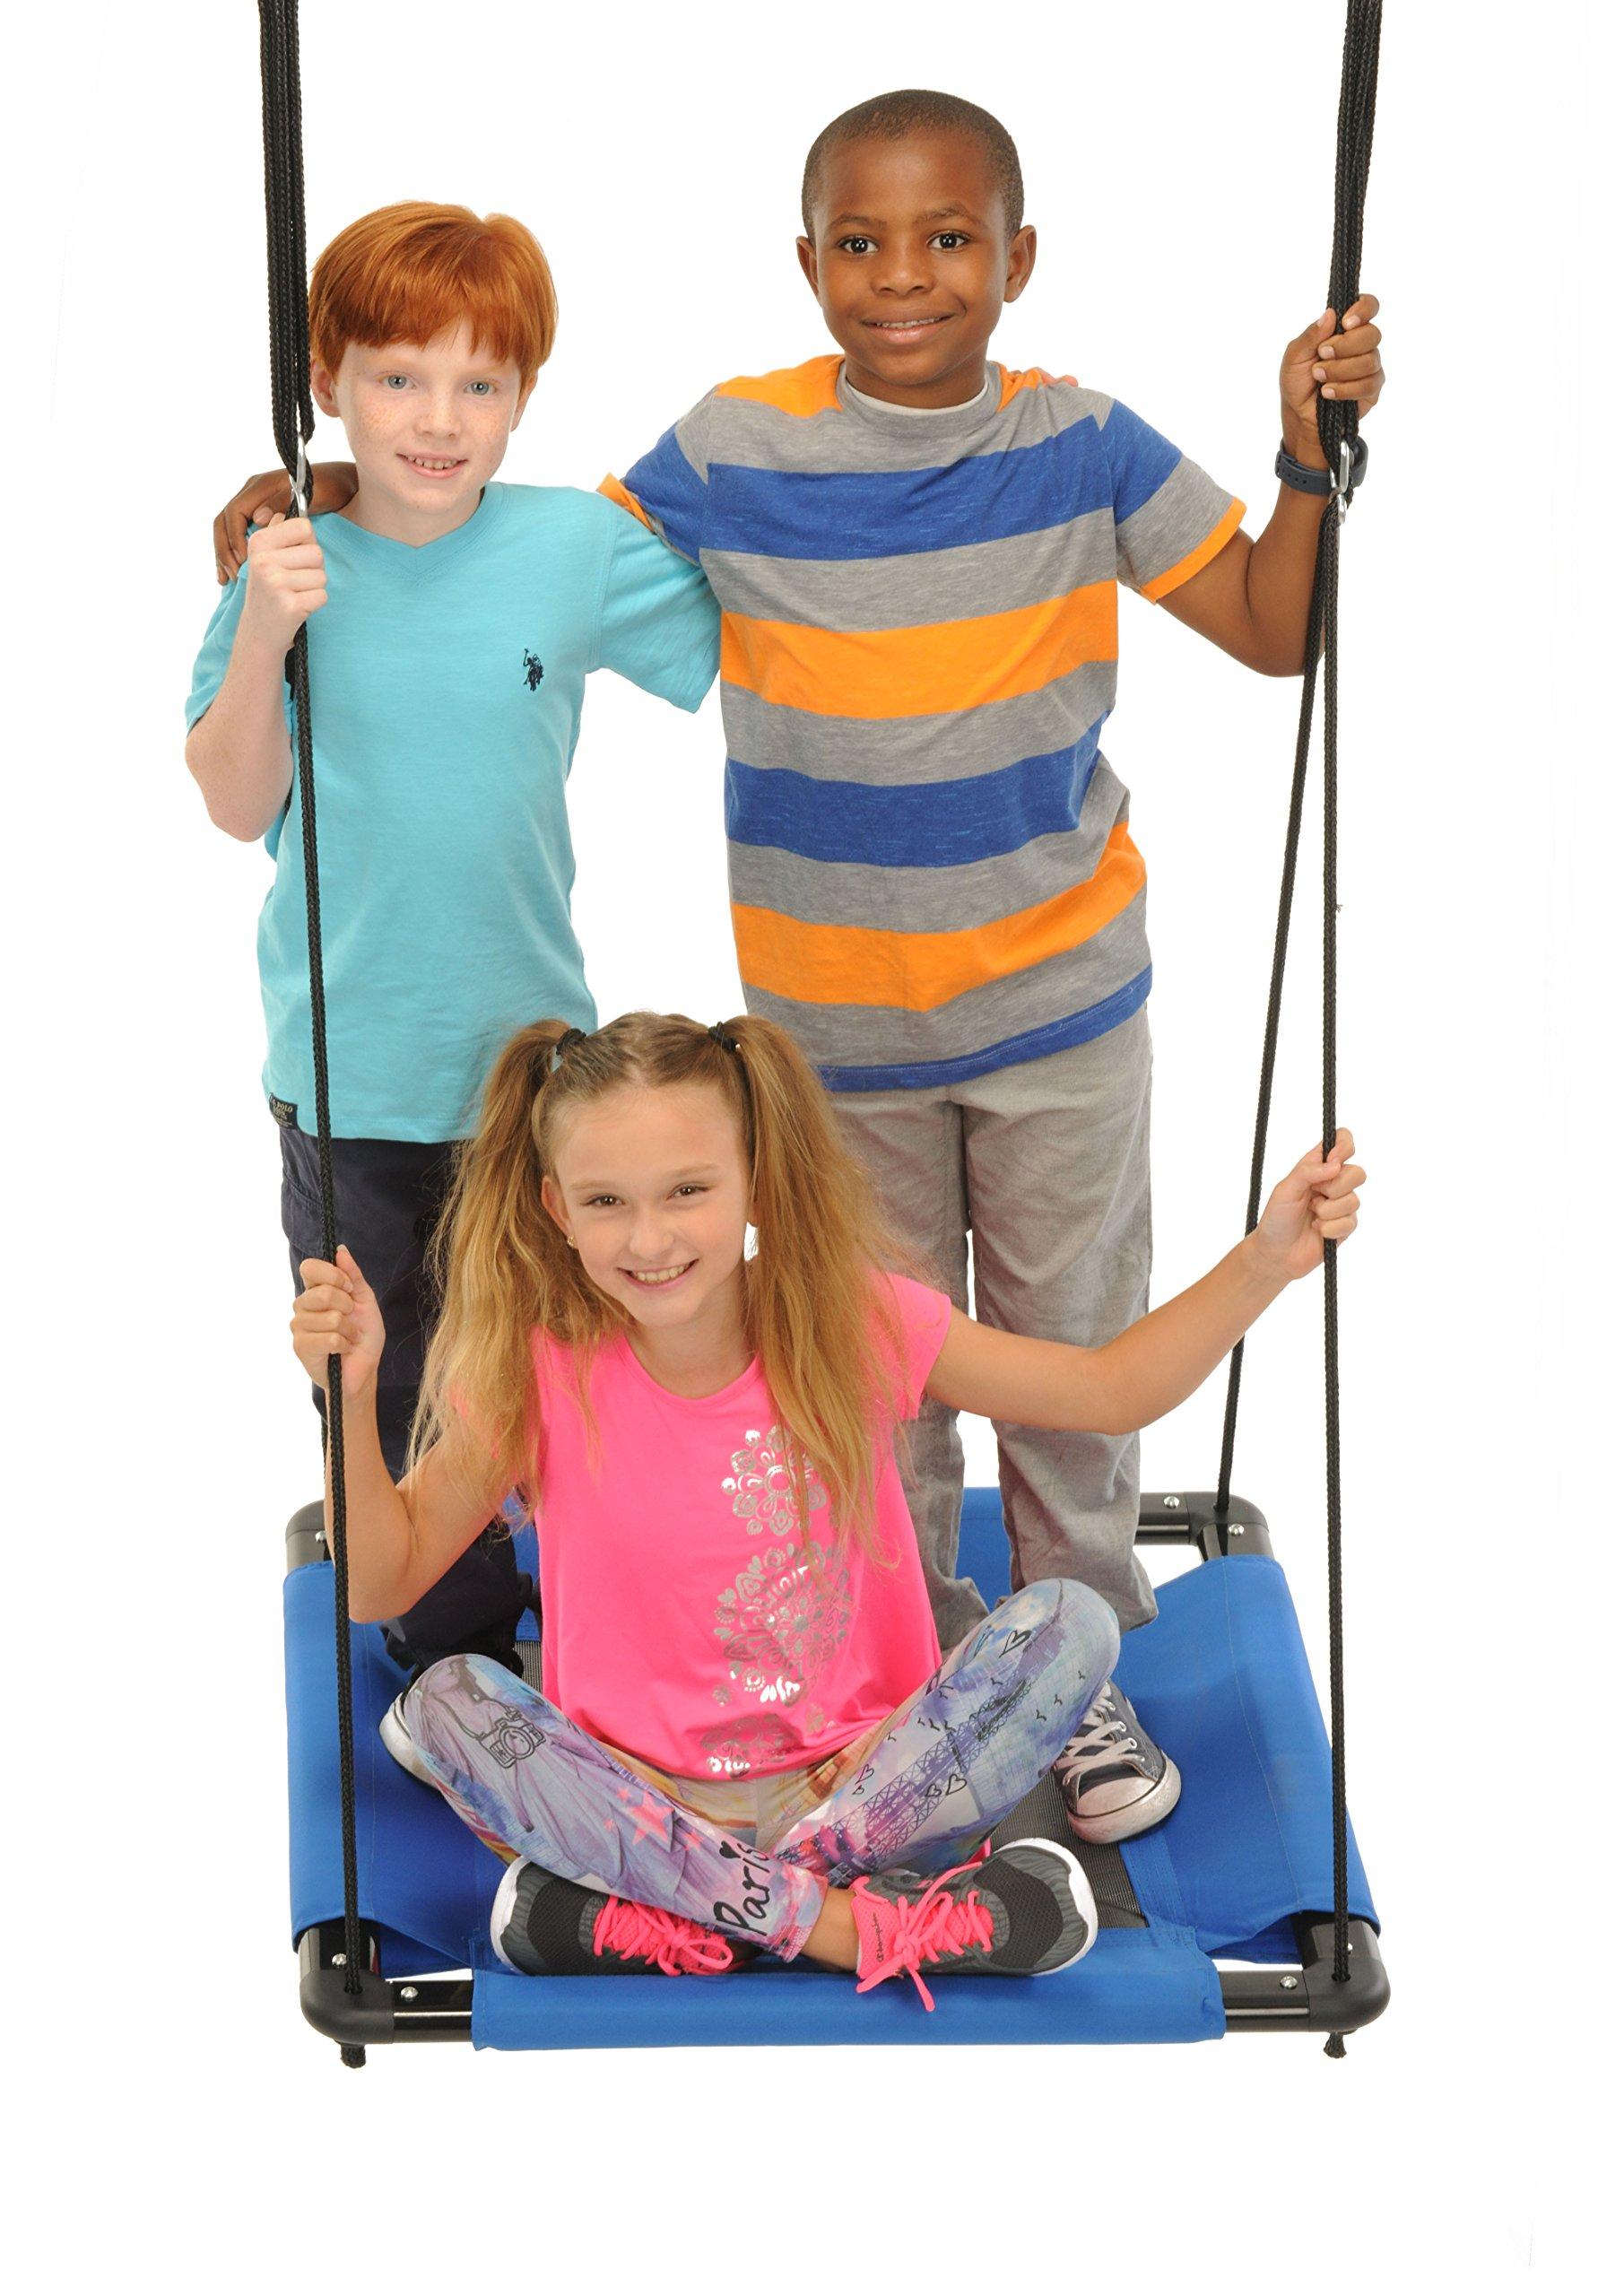 Swinging Monkey Products Square Platform Swing, Blue, 32'' by Swinging Monkey Products